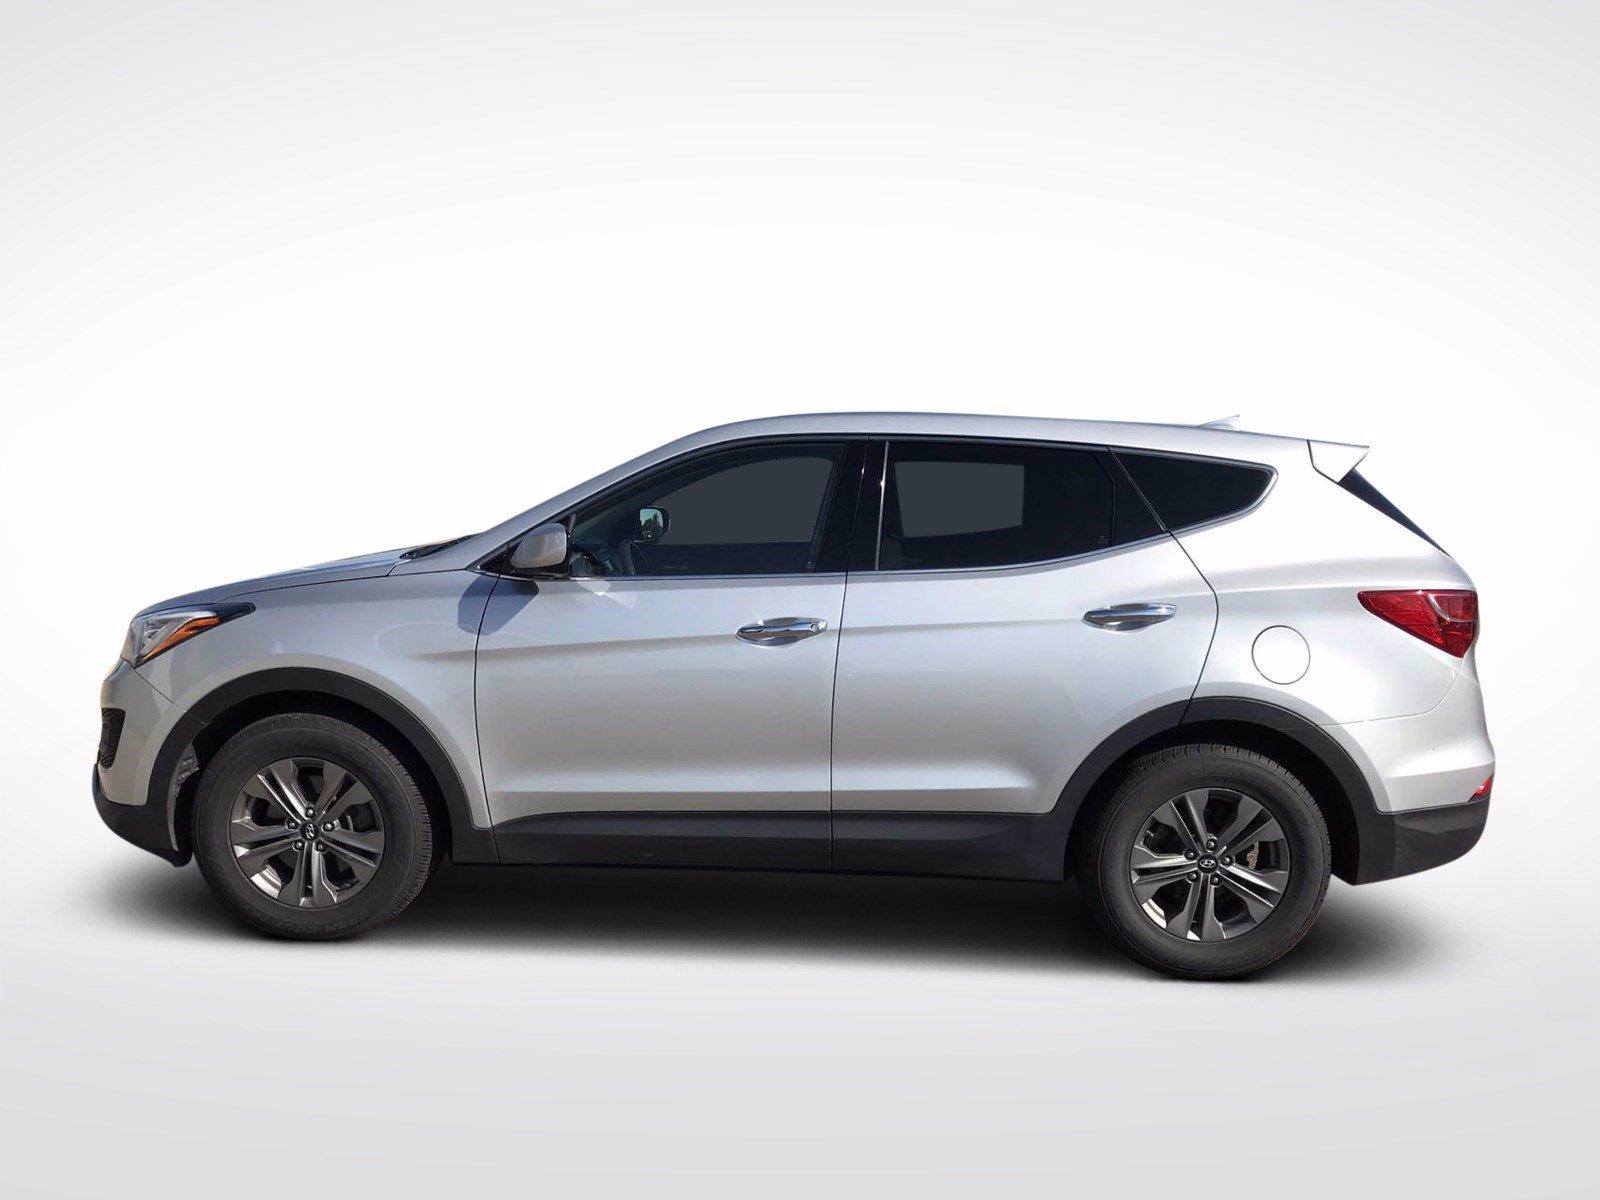 Used 2015 Hyundai Santa Fe Sport with VIN 5XYZTDLB7FG261986 for sale in Willmar, Minnesota